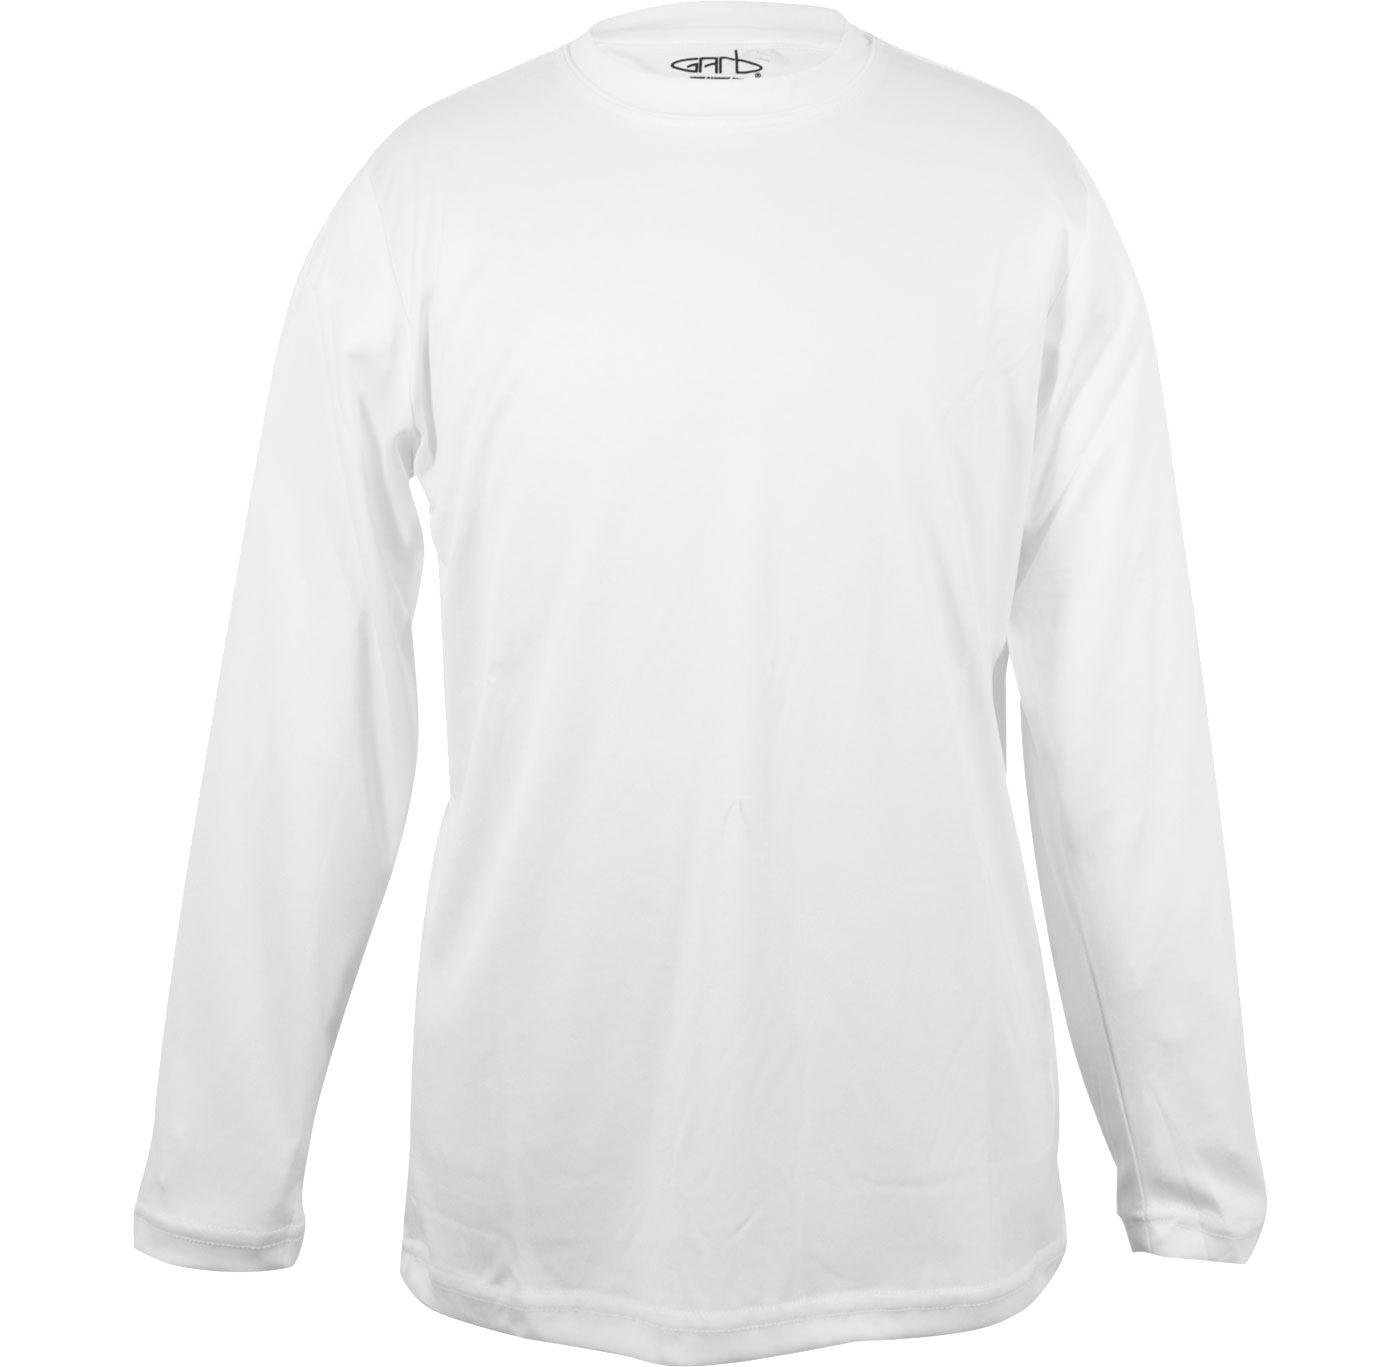 Garb Youth Jessie Long Sleeve Shirt